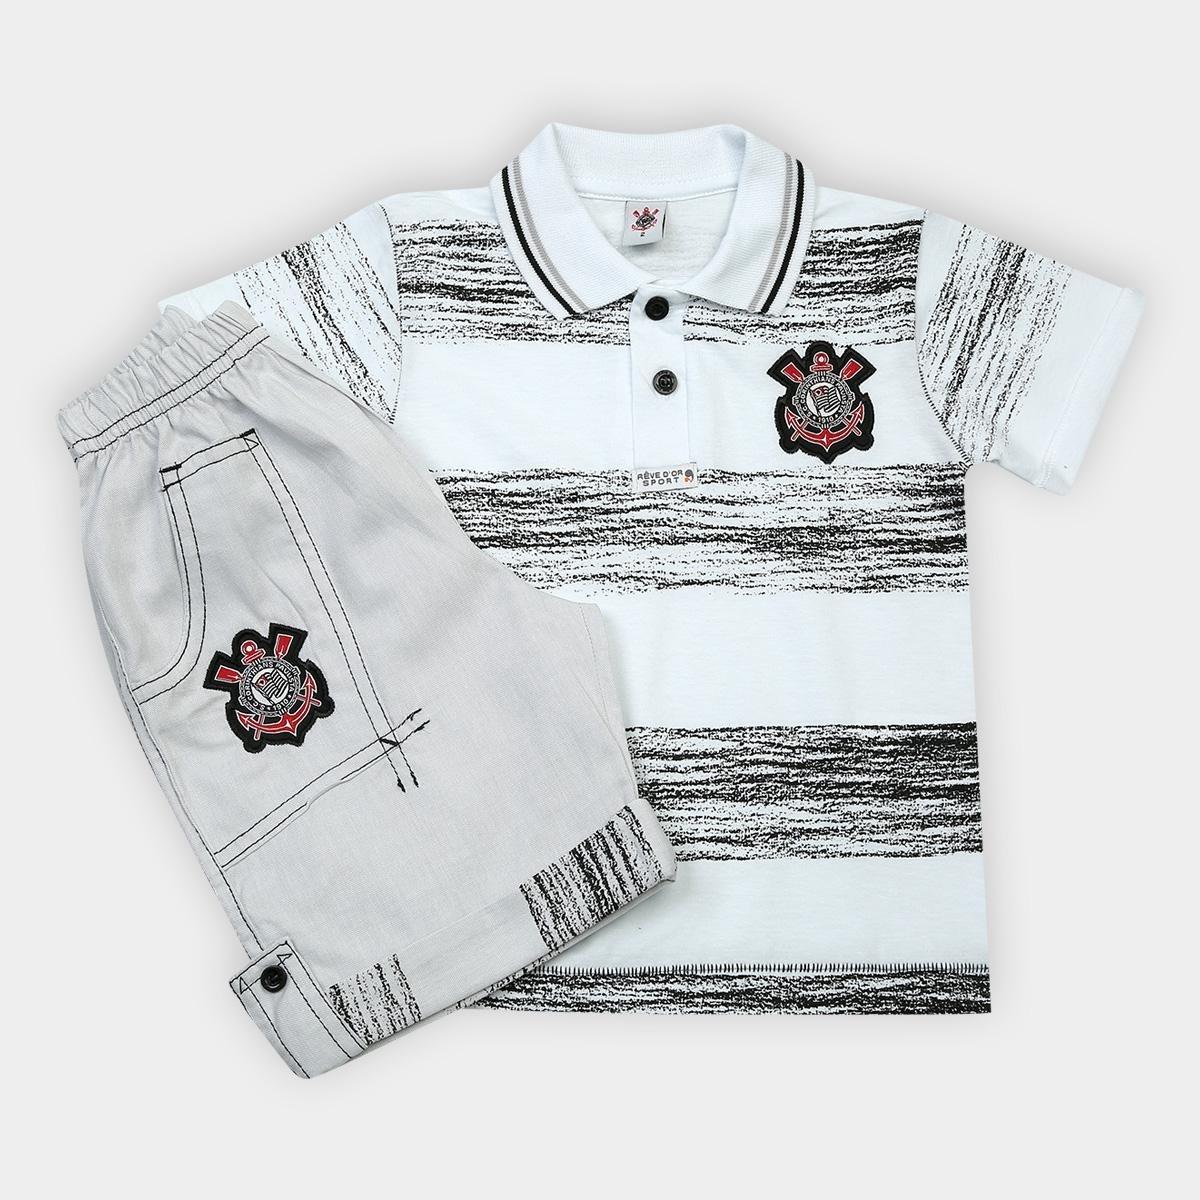 296b0bb66f Conjunto Corinthians Infantil Camisa Polo e Bermuda - Compre Agora ...